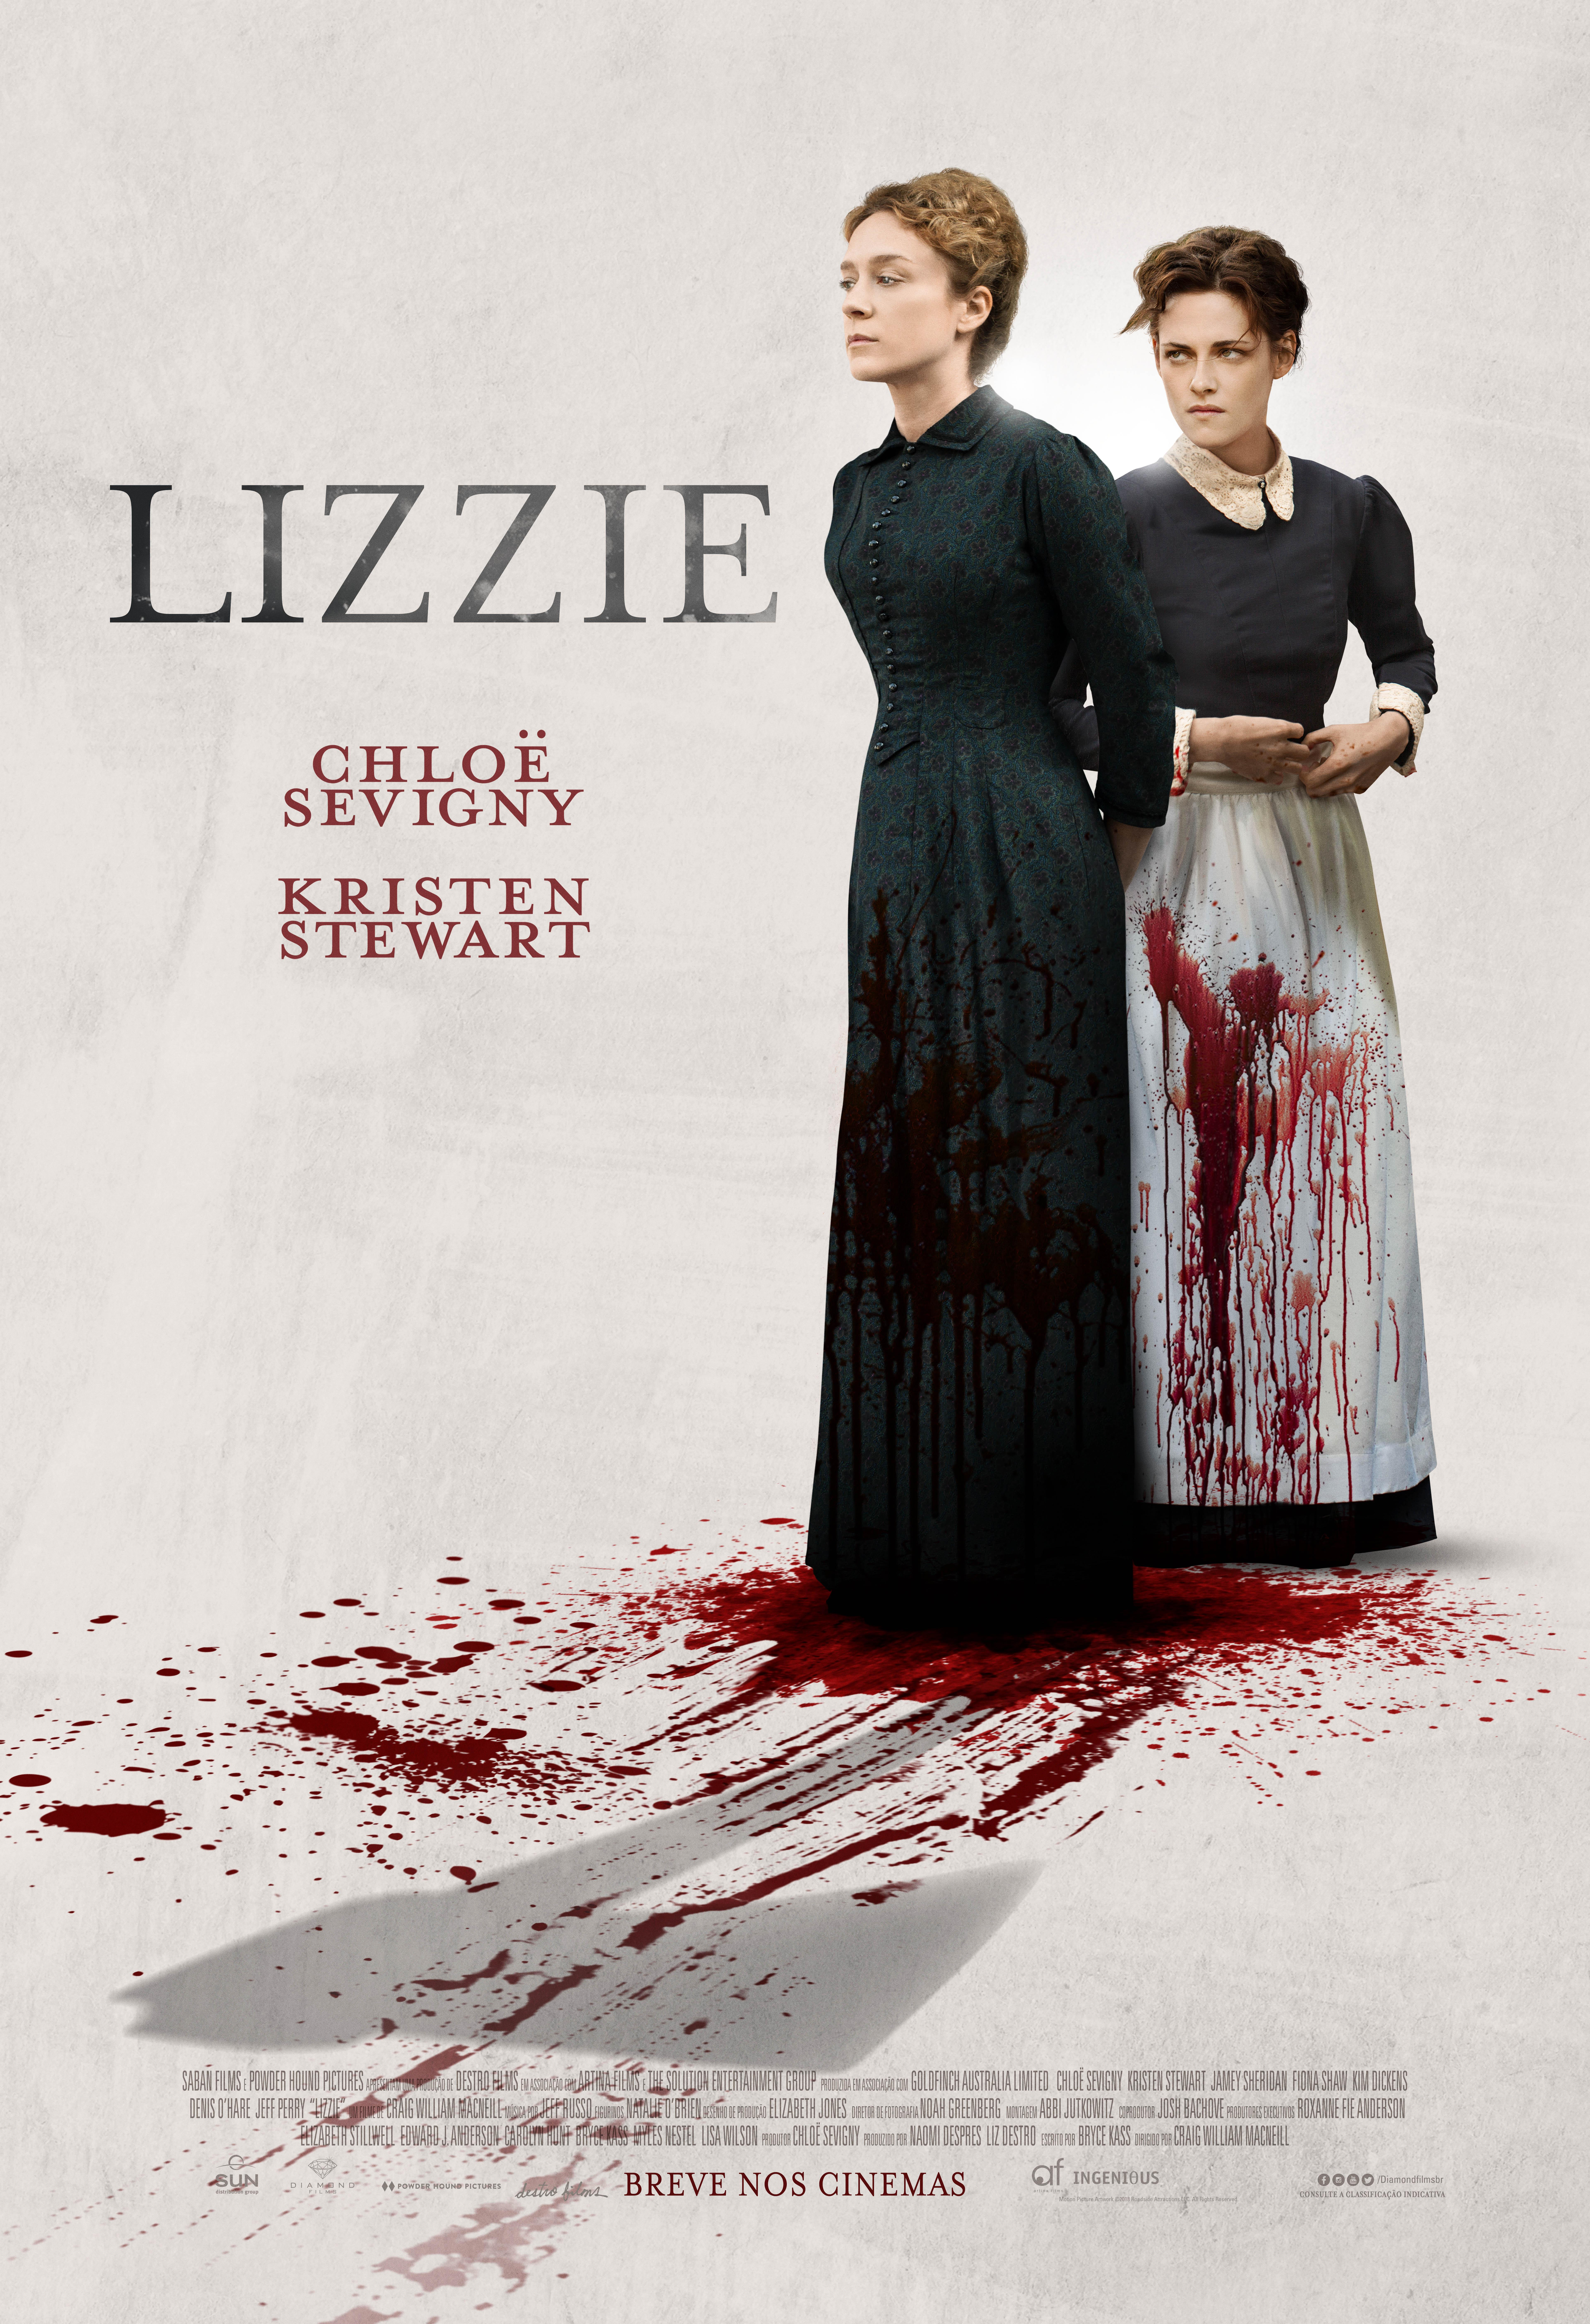 Pôster do filme Lizzie